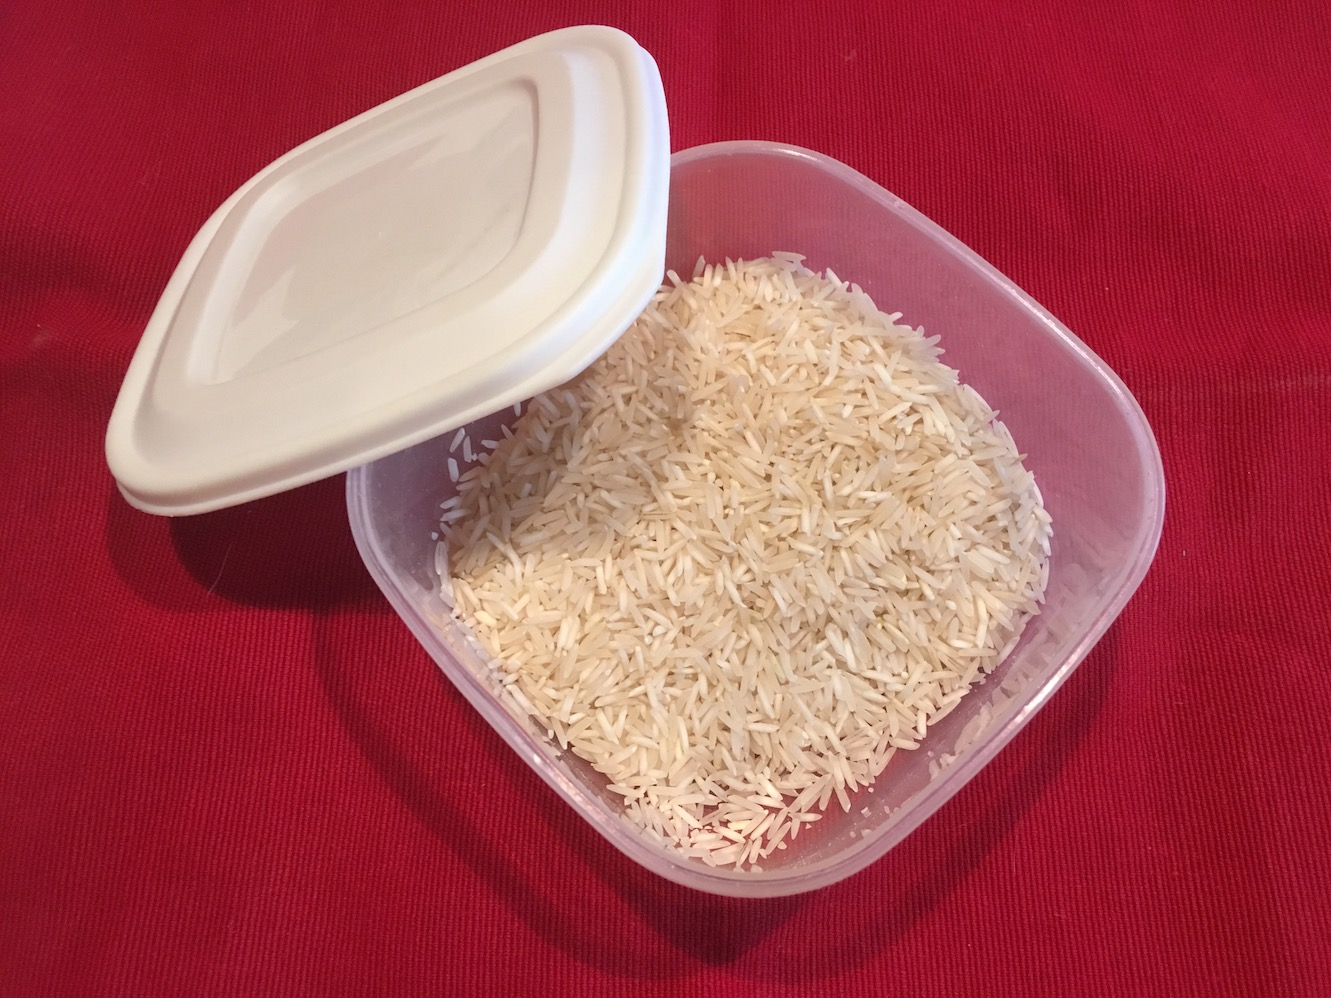 Gregor: Rice